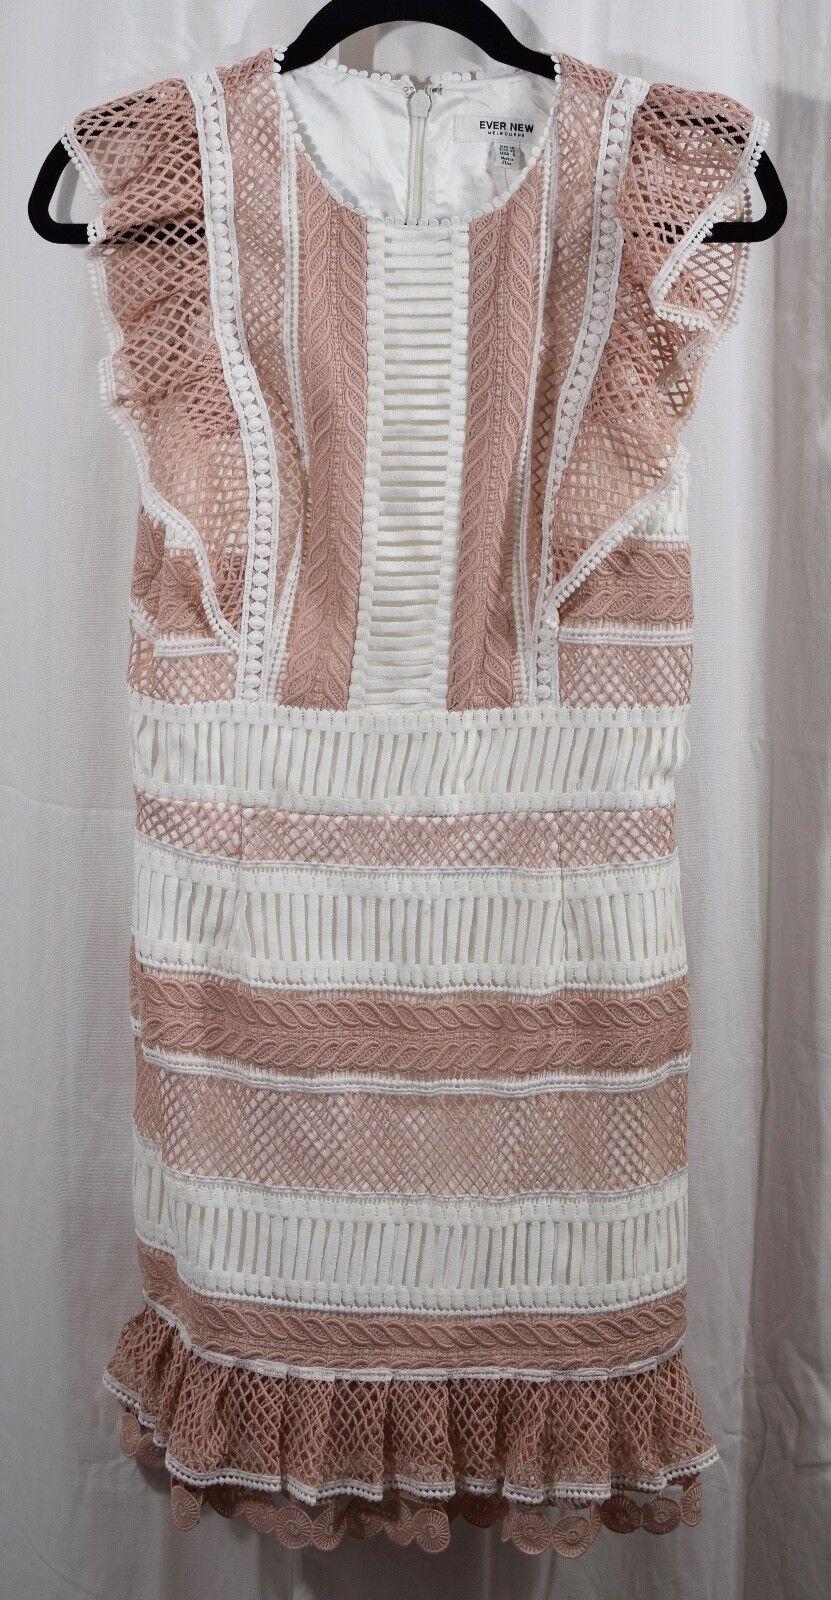 Ever New Melbourne Kingston Lace Frill Dress Größe US 6